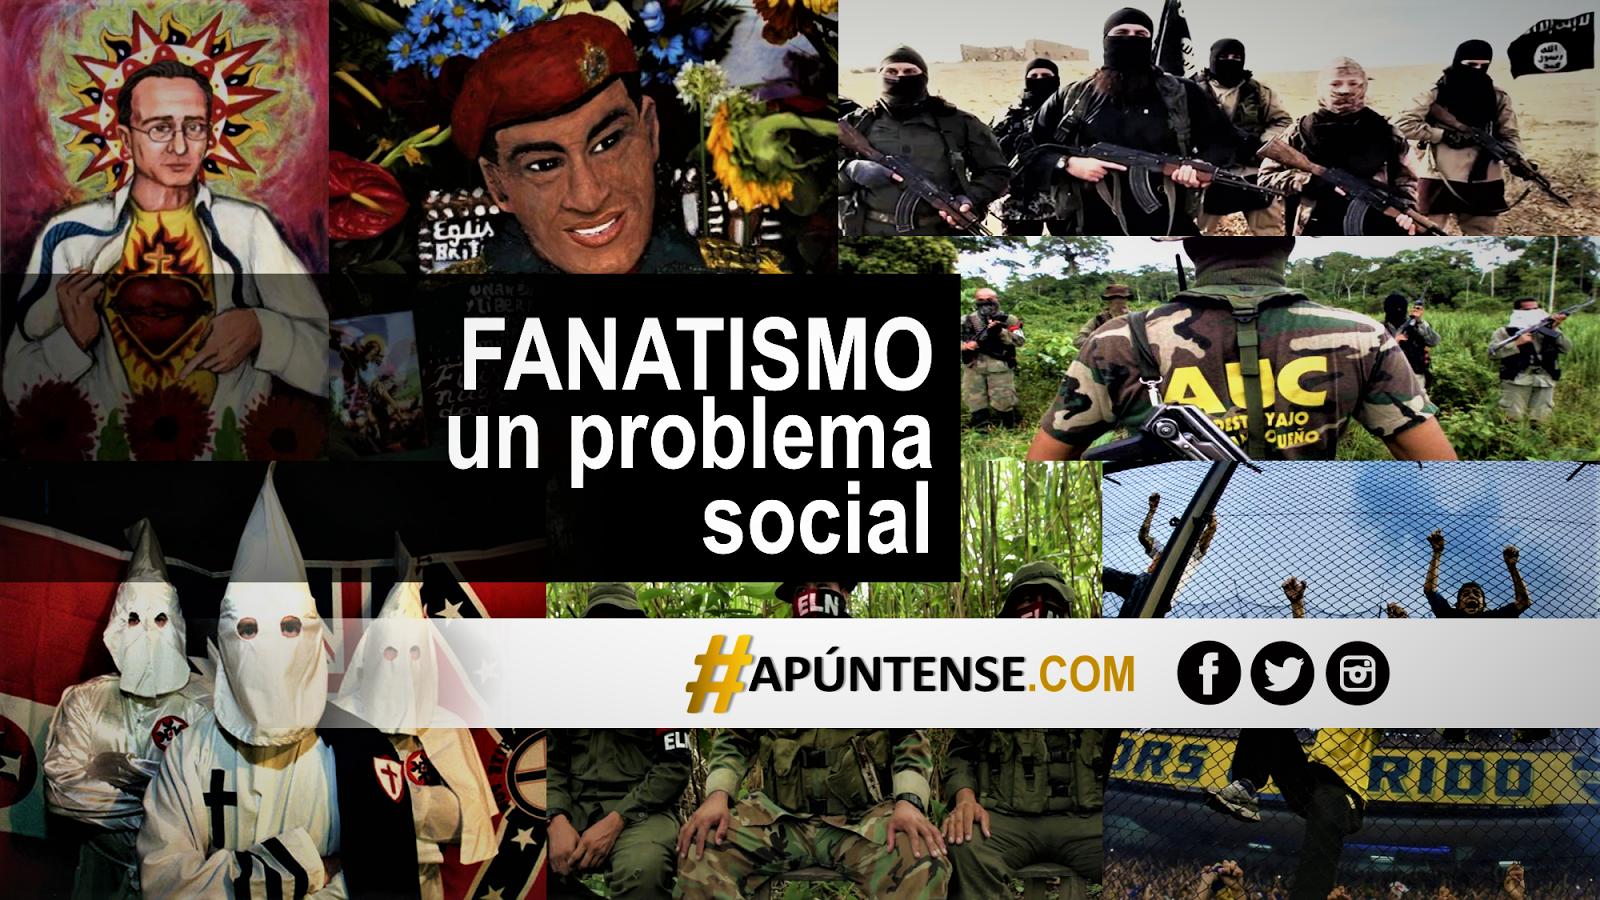 Fanatismo, un problema social. | Apúntense